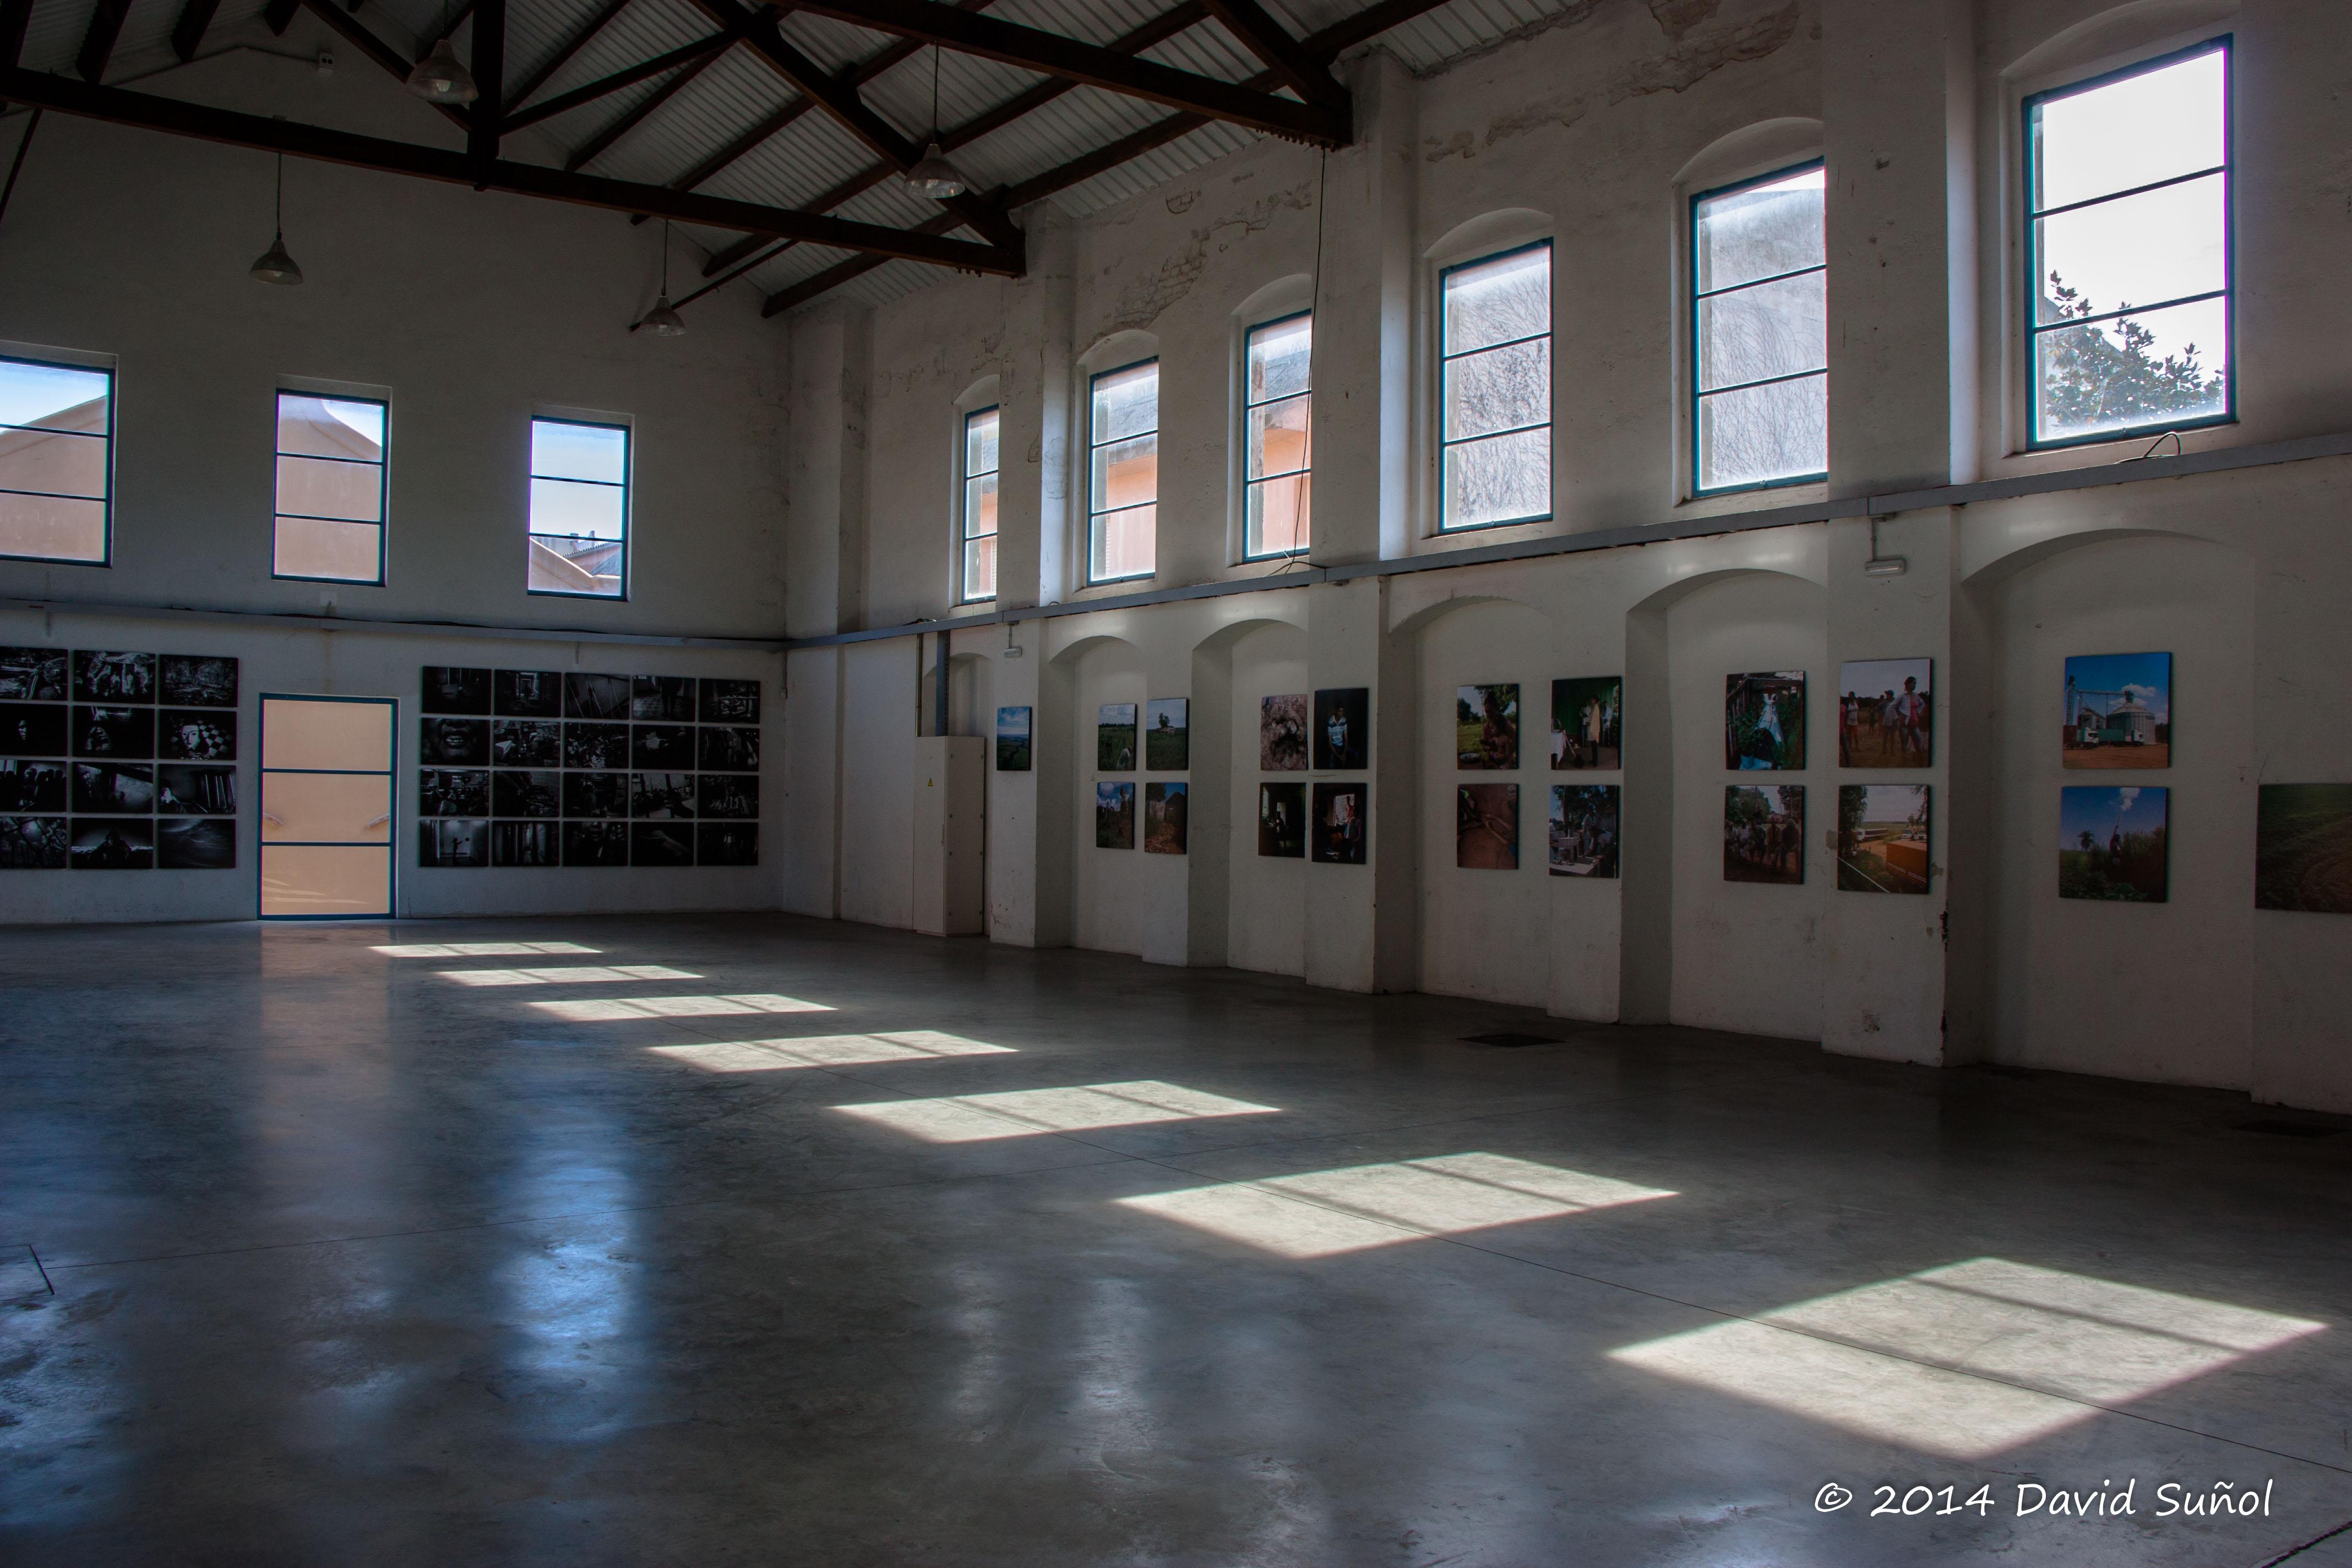 La Bòbila - VIII Biennal de Fotografia Xavier Mischerachs. Palafrugell 2014